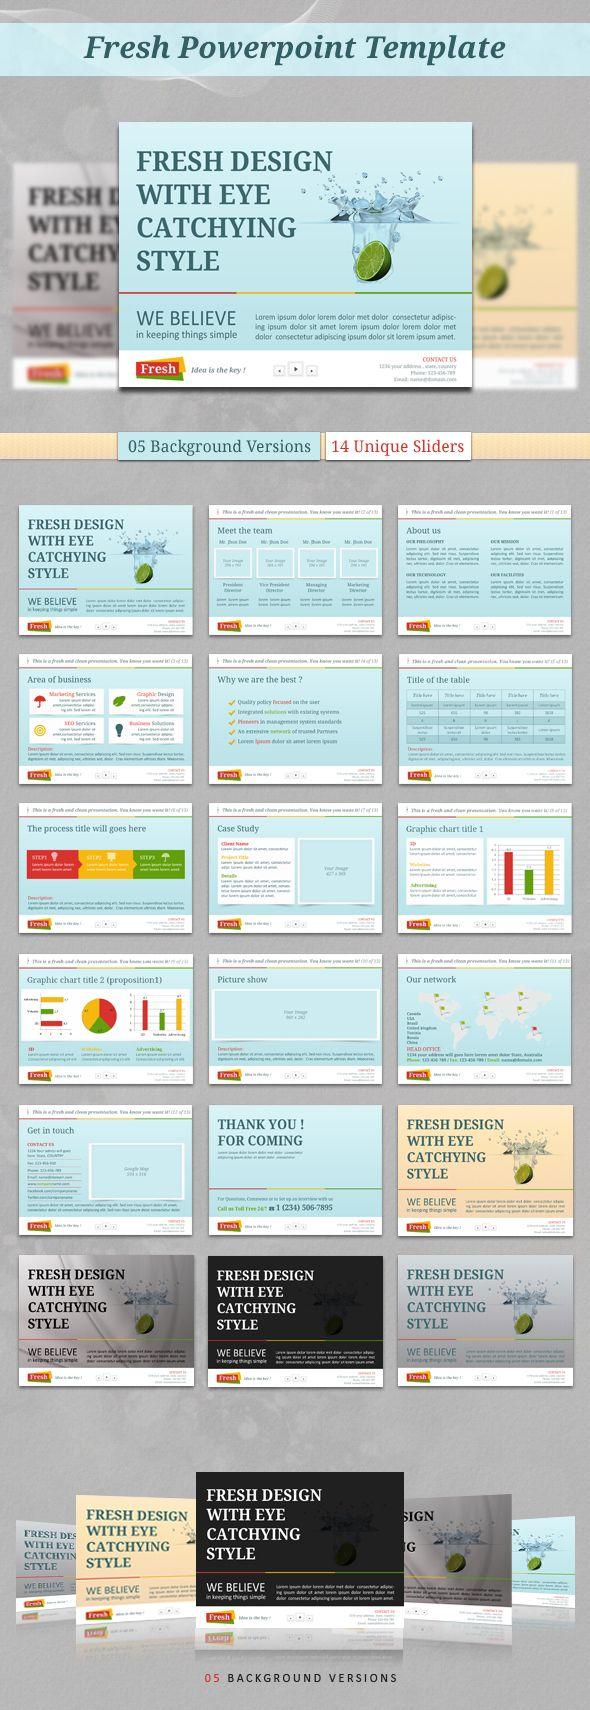 Fresh PowerPoint Template by kh2838 Studio, via Behance